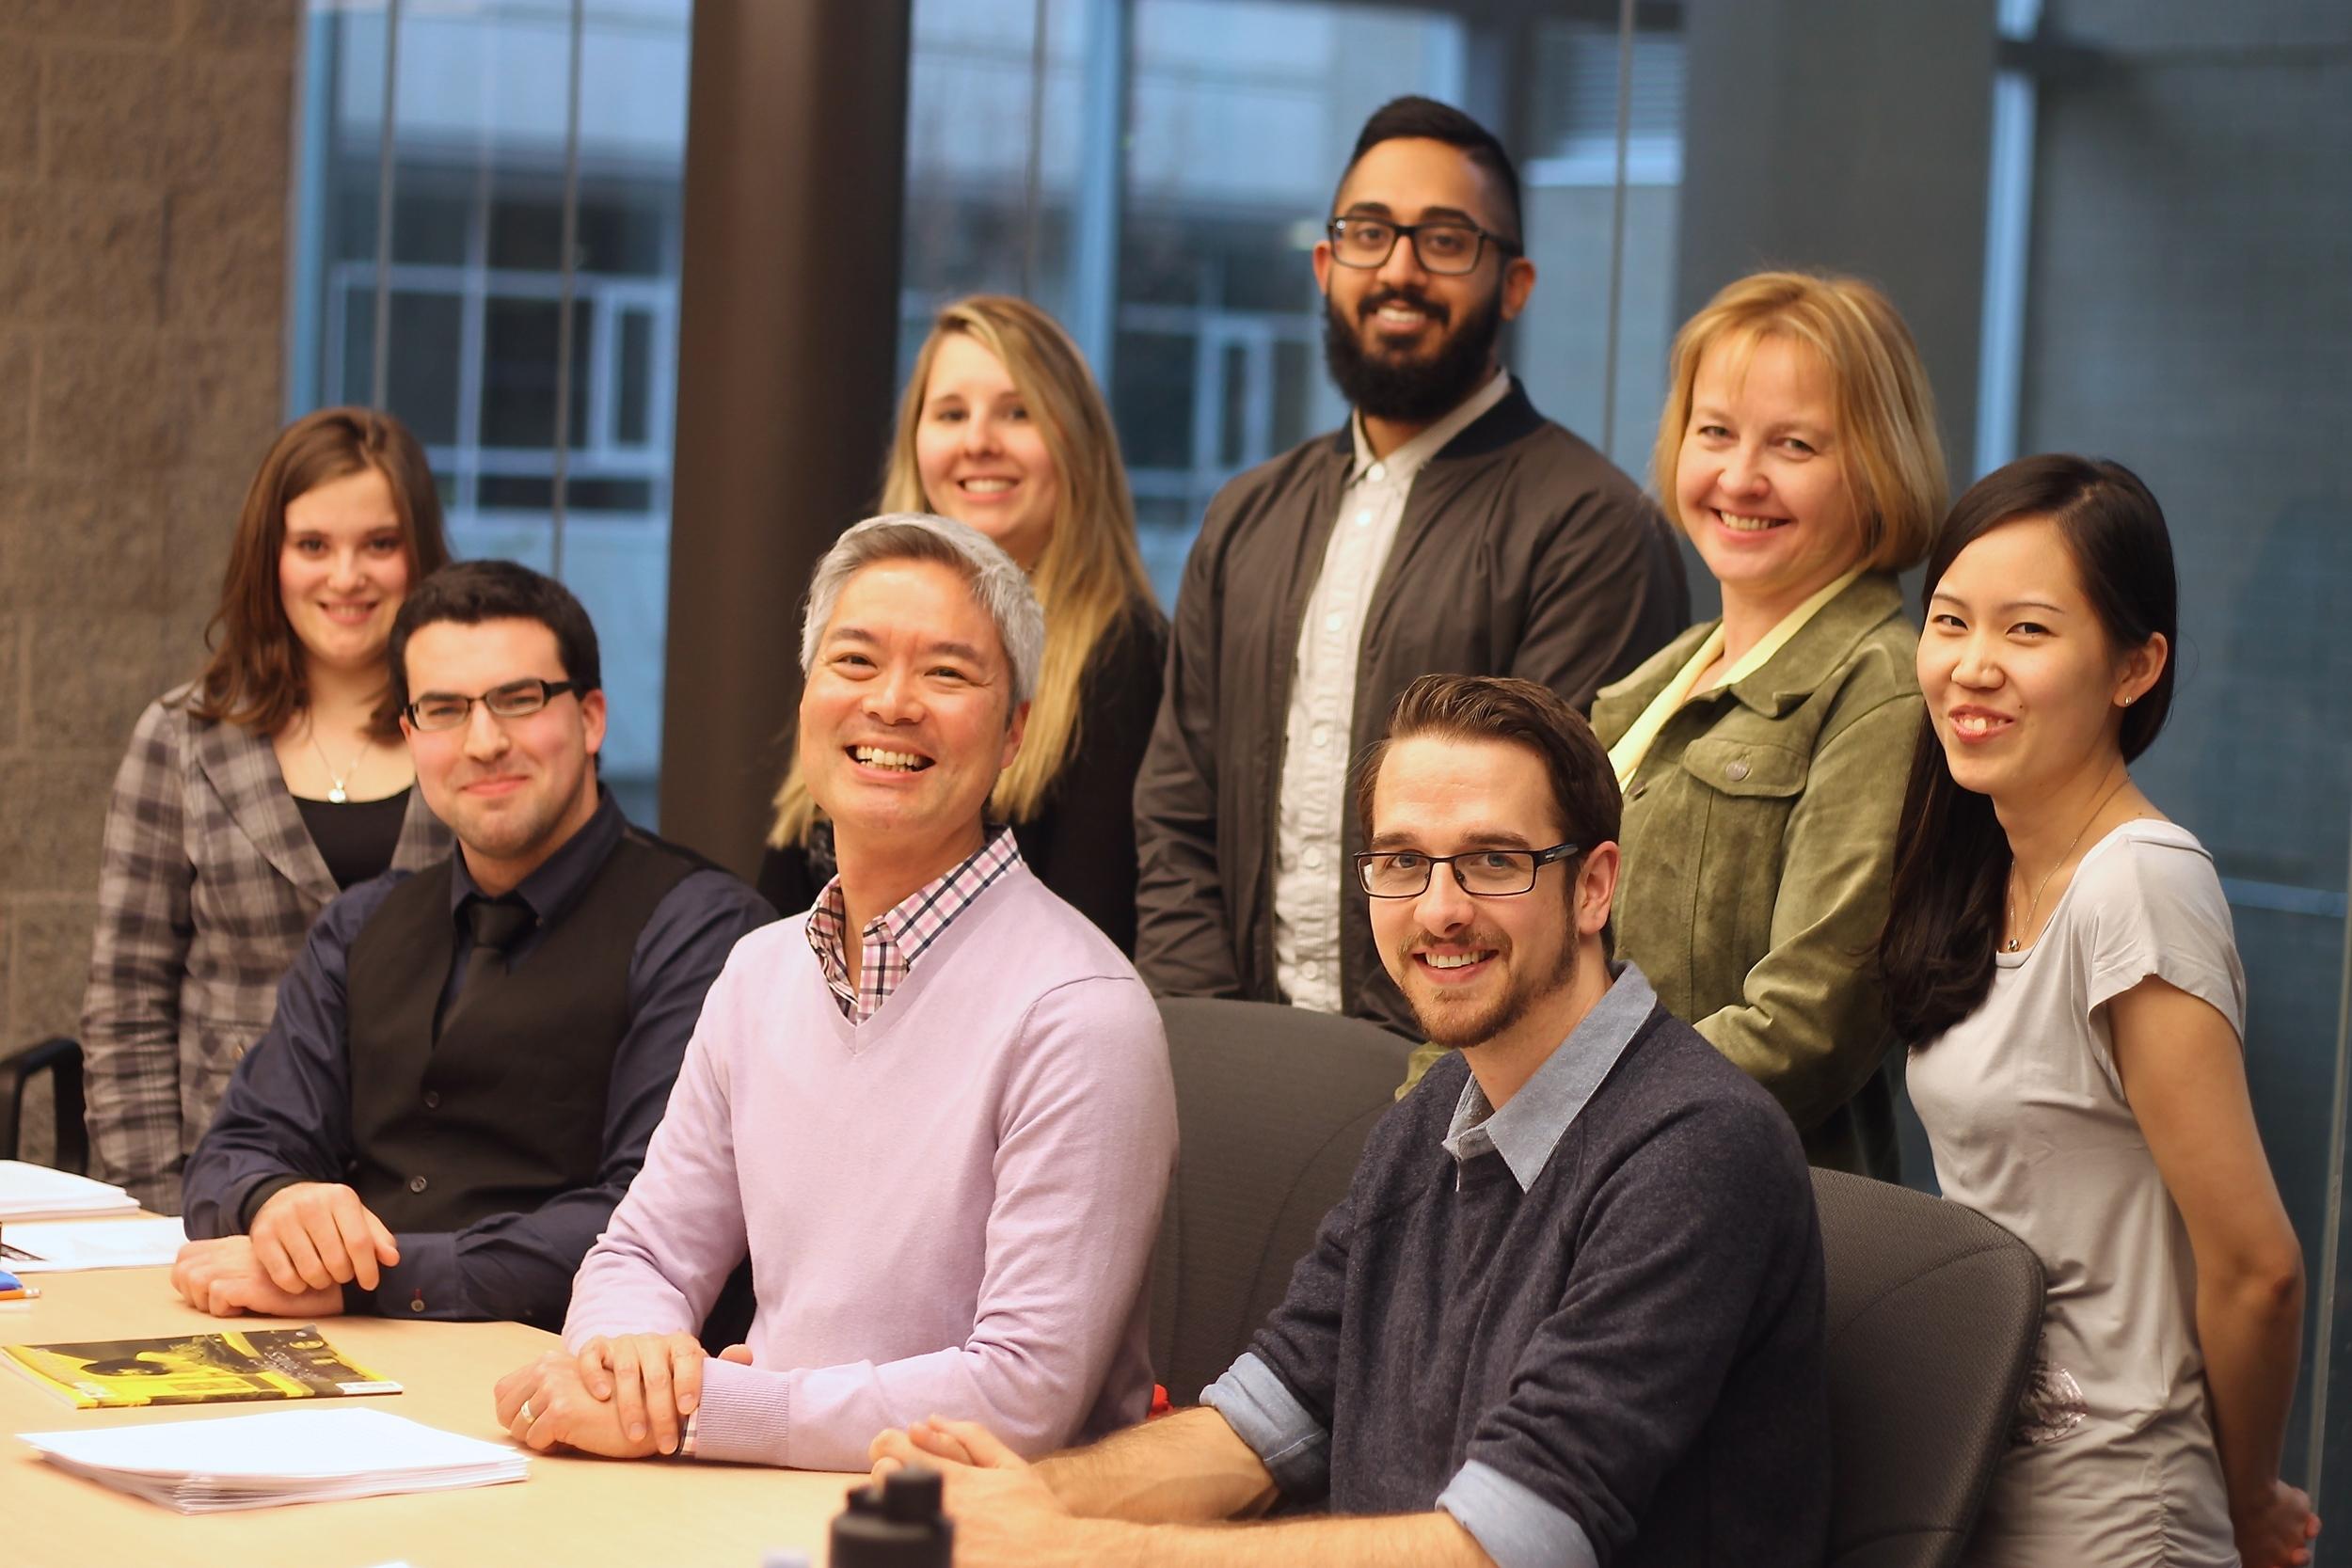 The Editorial Board of  Film Matters  (7.2 2016): Rachael Ransom, Mathew Fabick, Greg Chan (Editor-in-Chief), Melissa Houghton, Neil Bassan, Fraser Readman, Irene Halliday, and Ann Soo-Yeon Kim